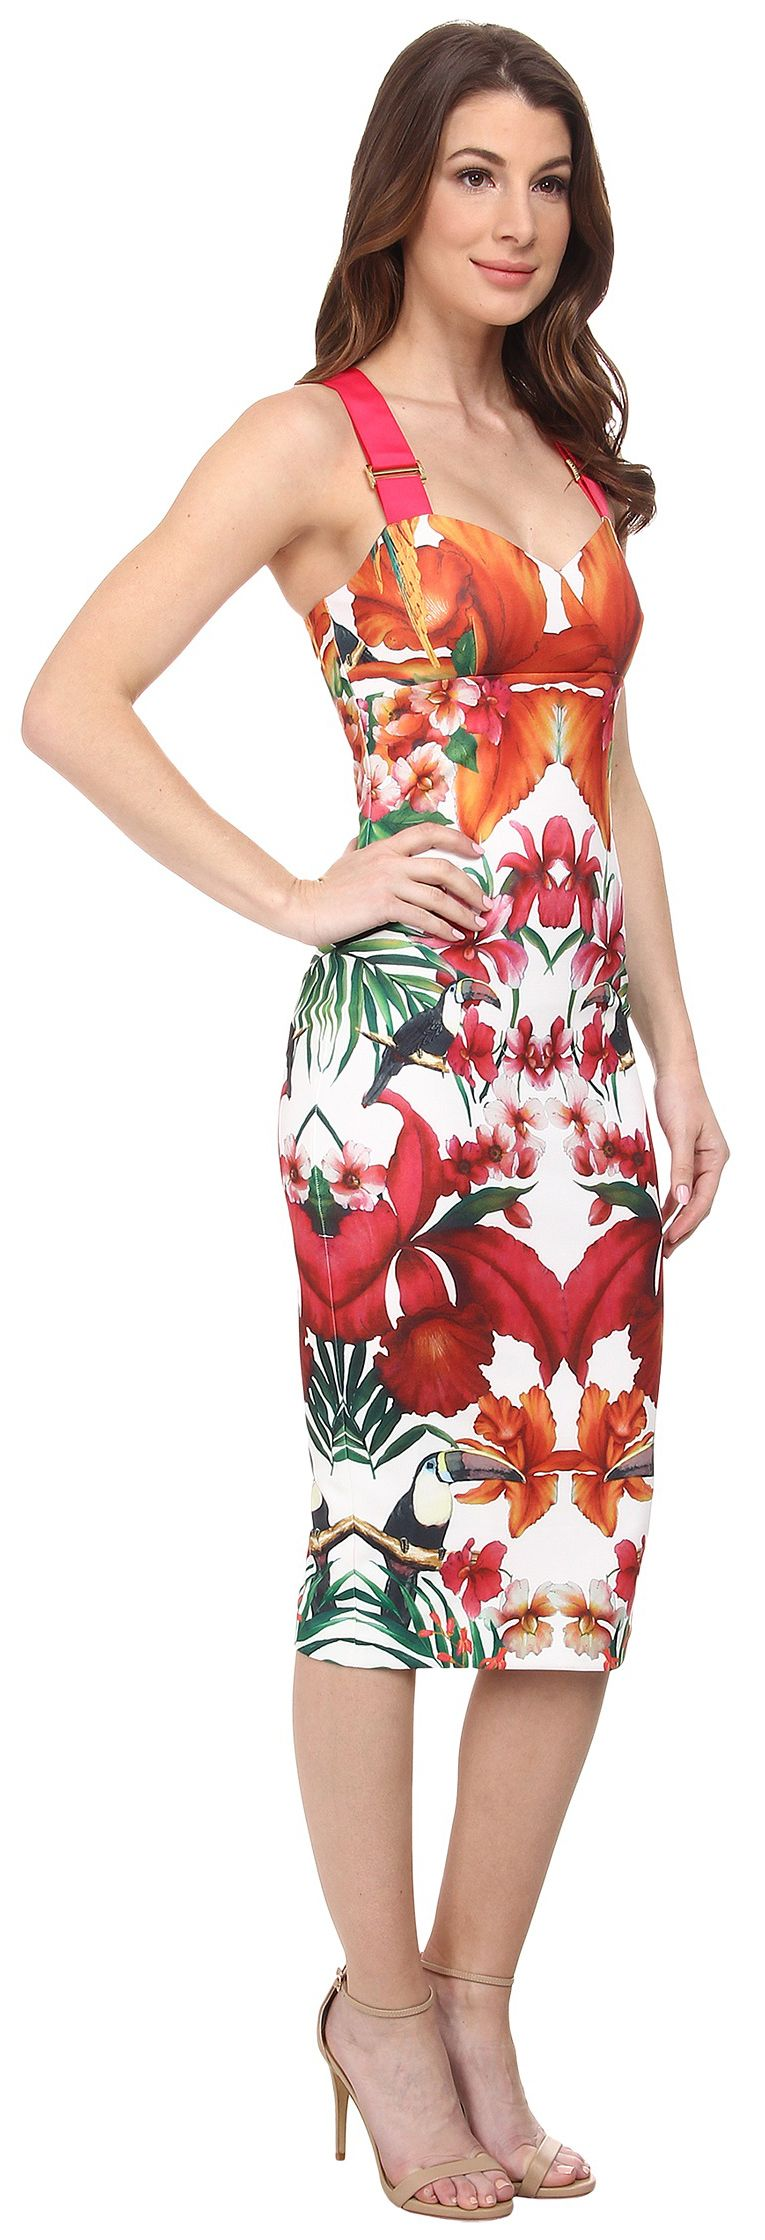 73b73fa4247d8  16 A95 D90 Ted Baker Jameela Tropical Toucan Midi Dress